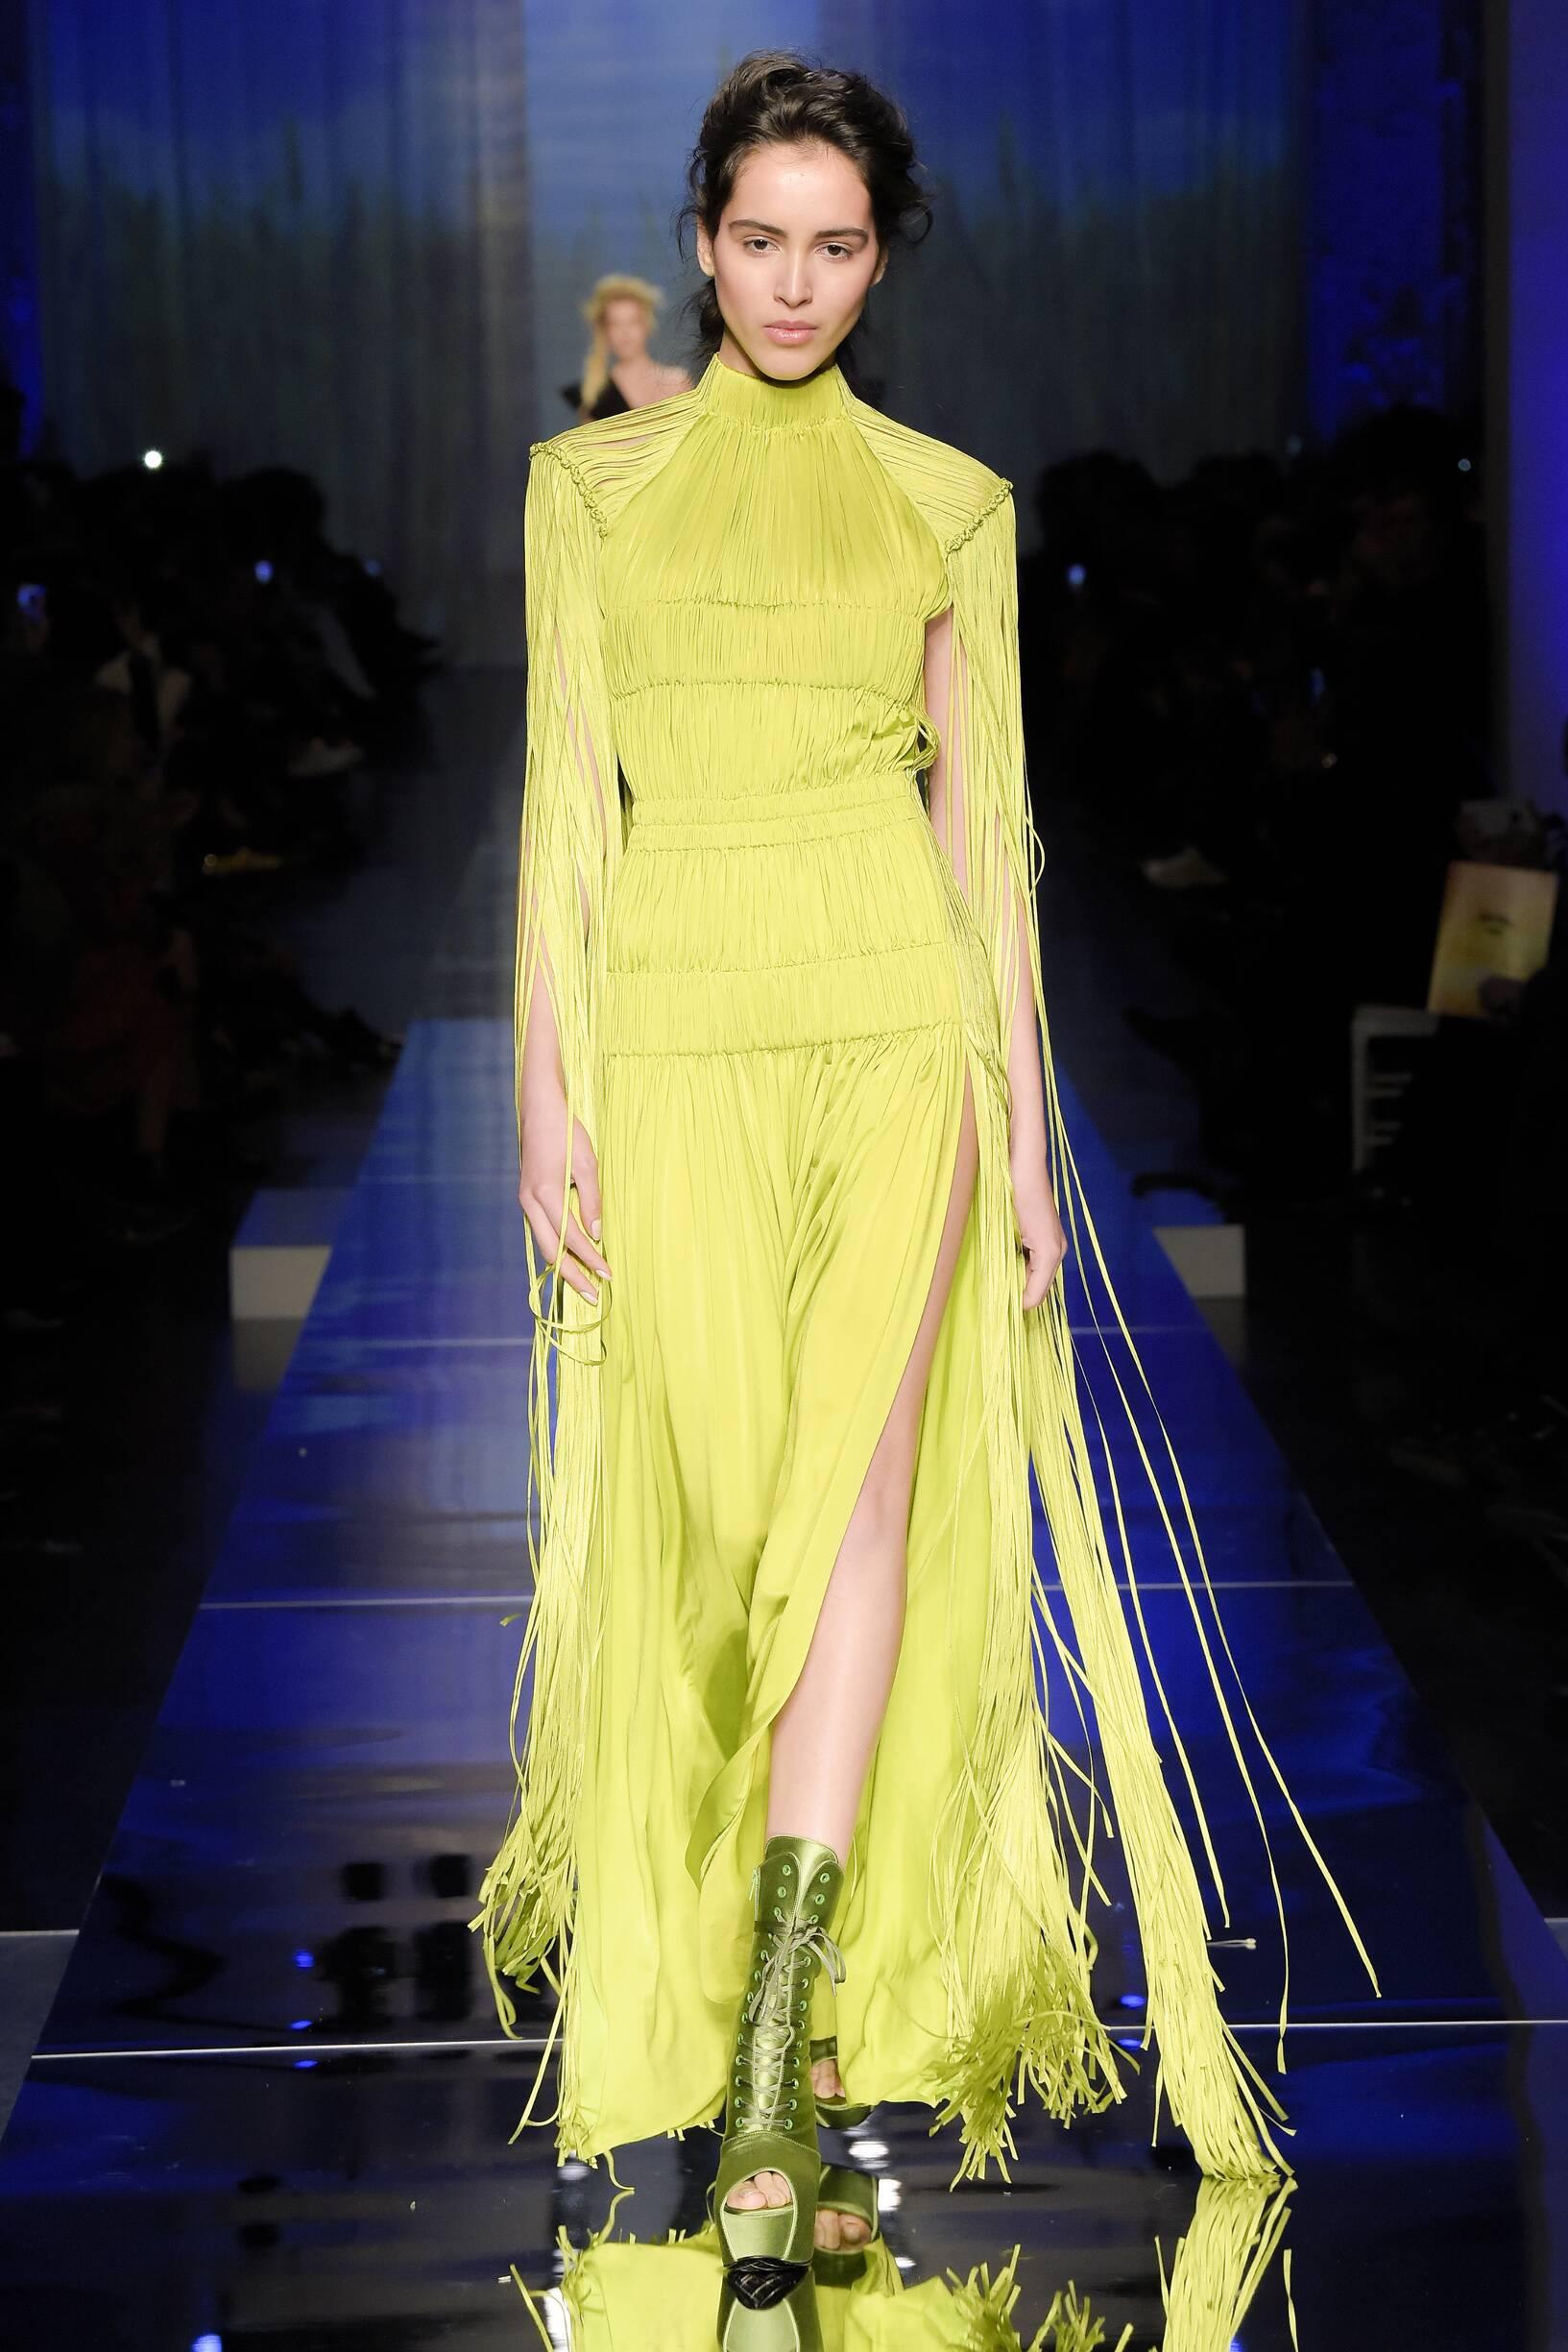 2017 Catwalk Jean Paul Gaultier Haute Couture Woman Fashion Show Summer